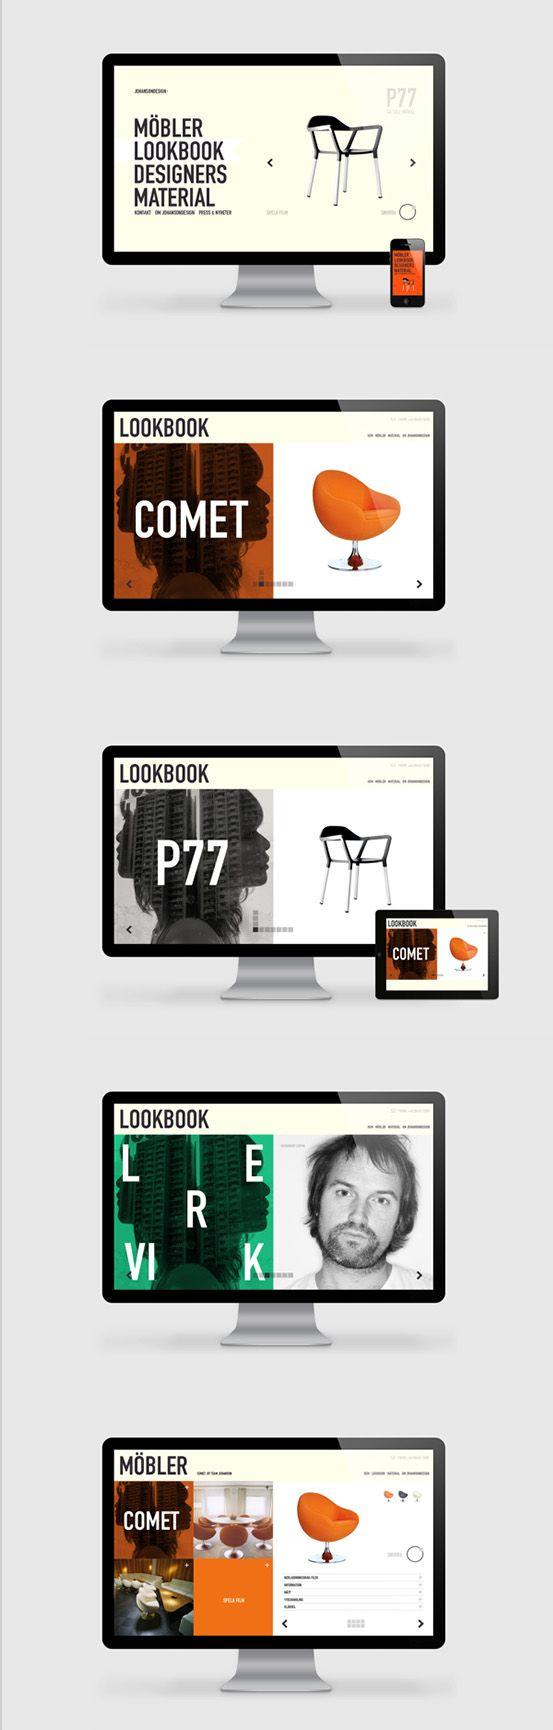 Johanson Design / WEB Art Direction, UI/UX, Web Design